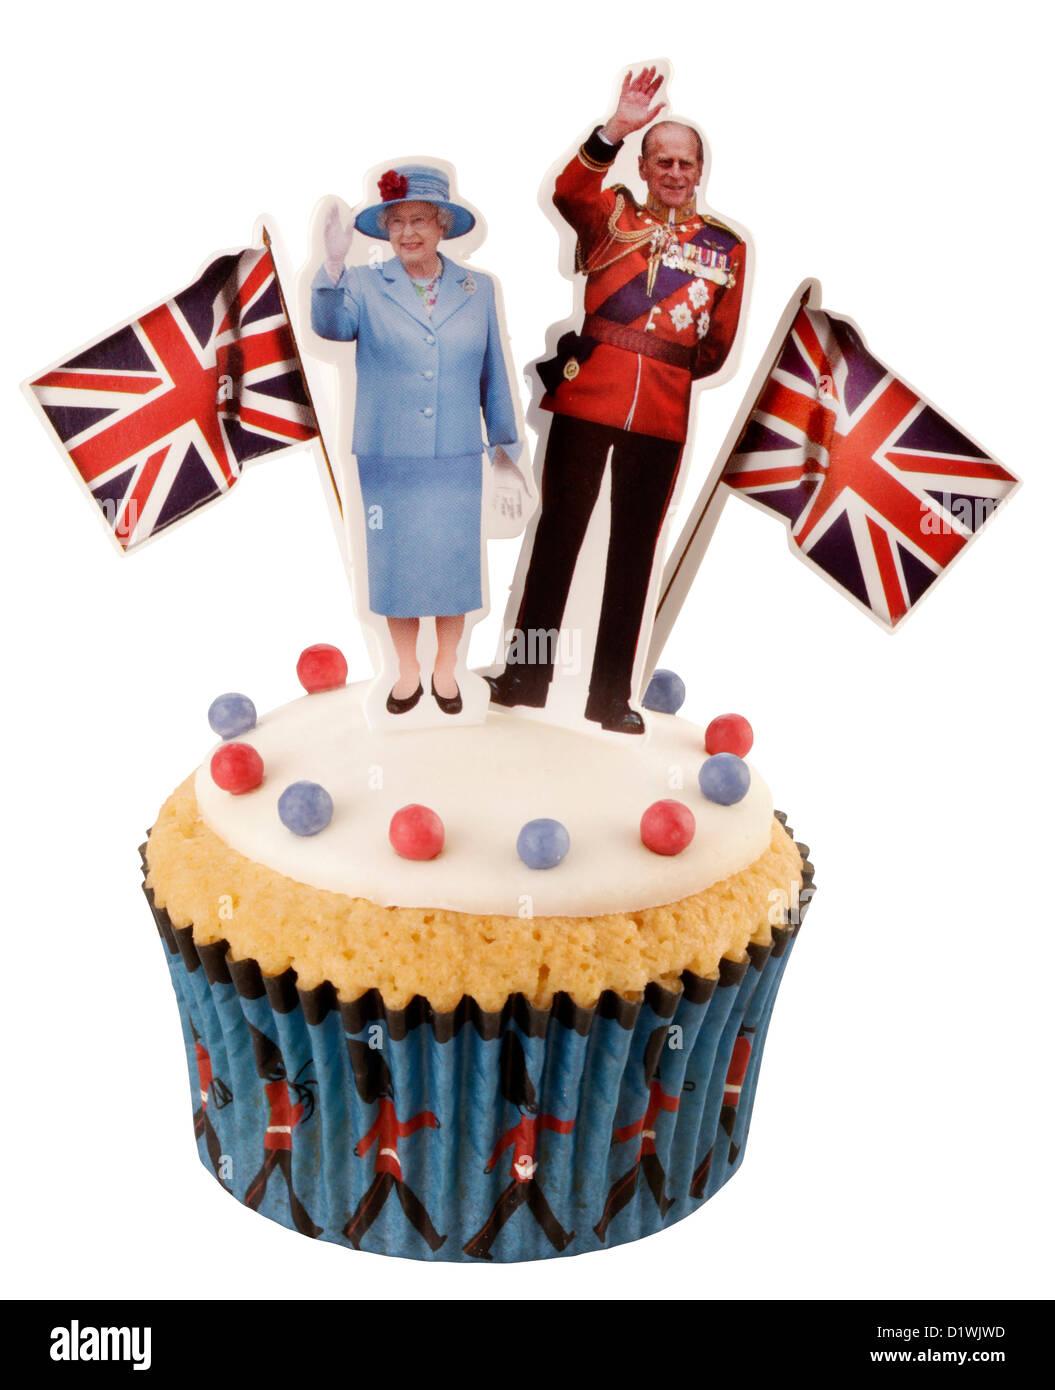 CUT OUT OF ROYAL BRITISH CELEBRATION CUPCAKE - Stock Image